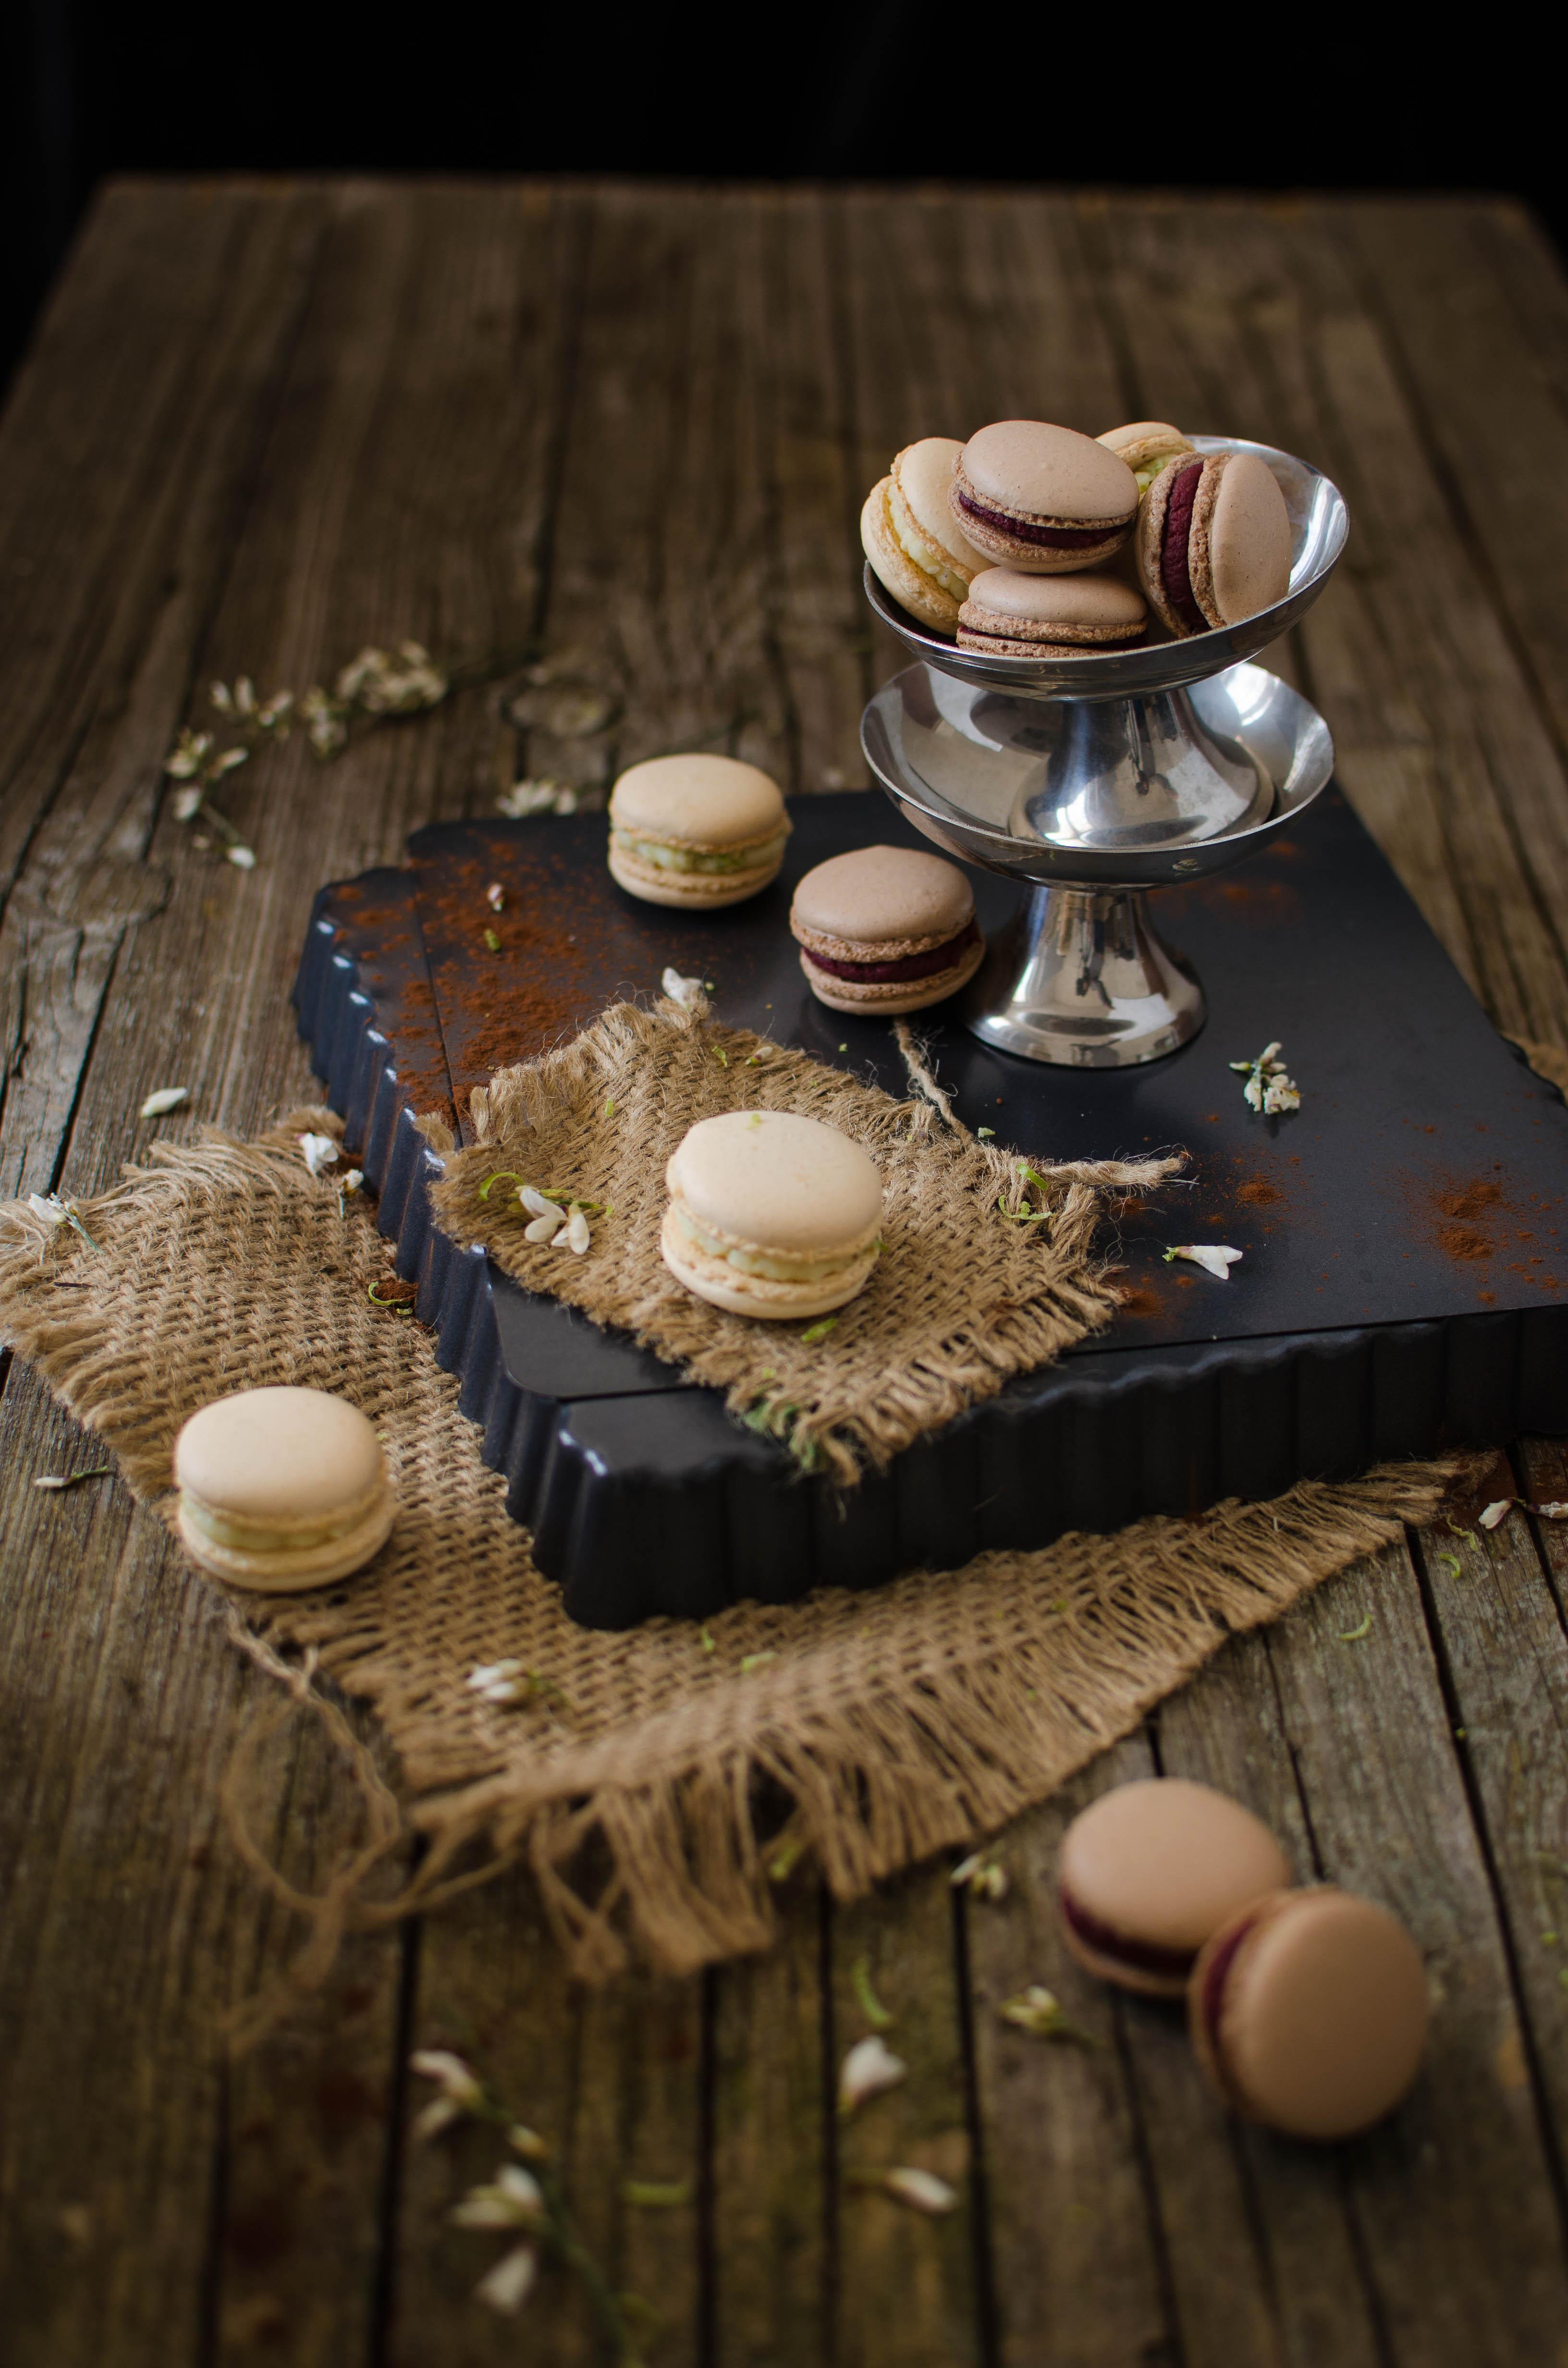 macarons_mtch Macarons al cioccolato con barbabietola, lime, cocco, arancia